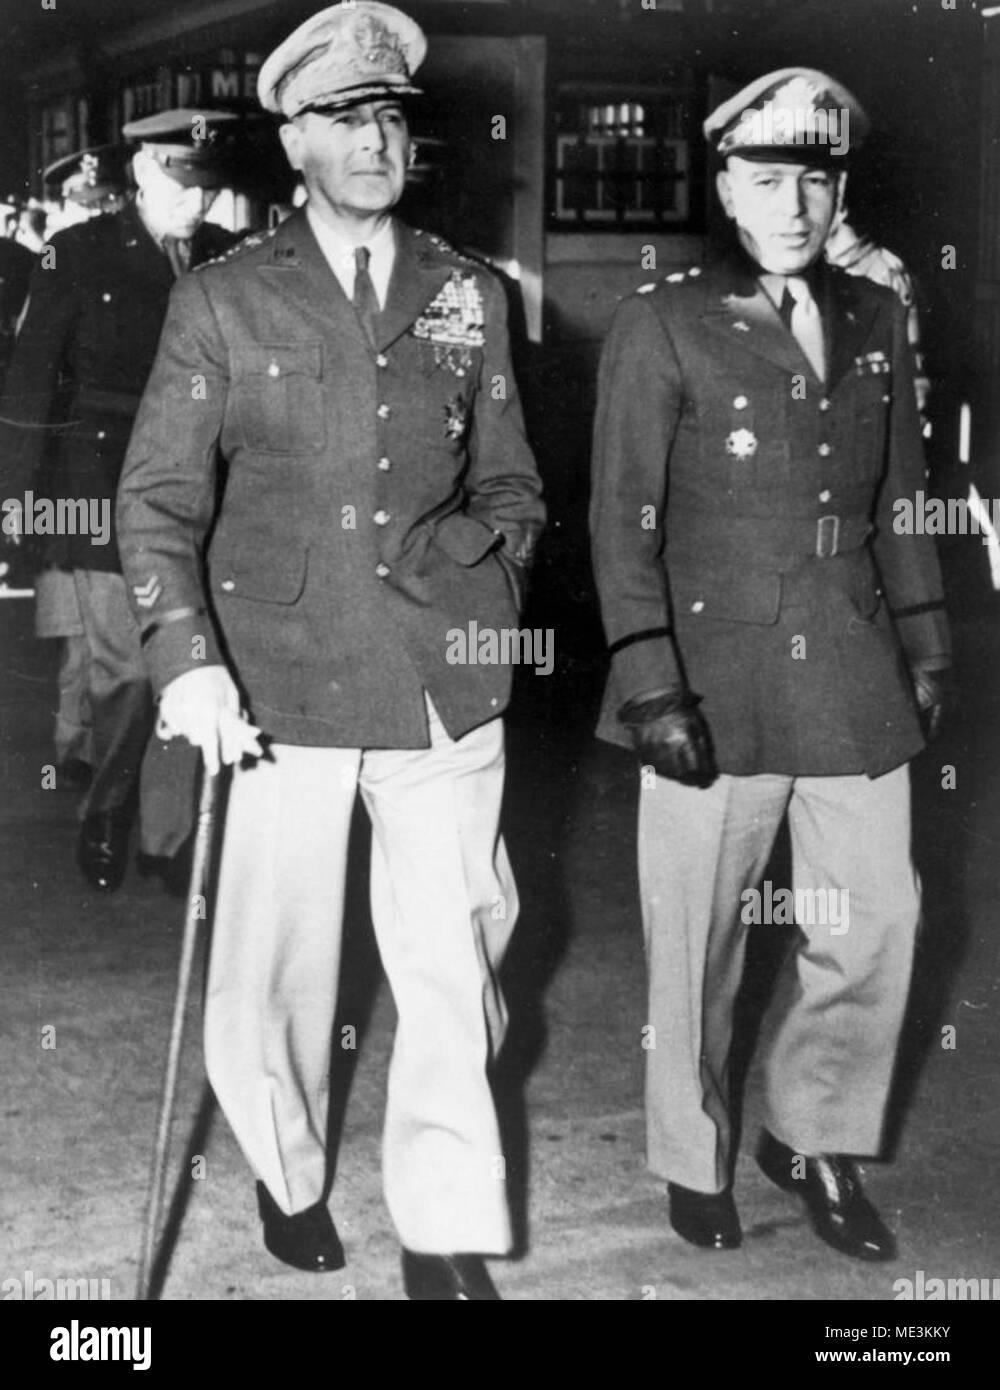 Army General Douglas MacArthur WWII Japanese Surrender Vintage Bronze Medal U.S